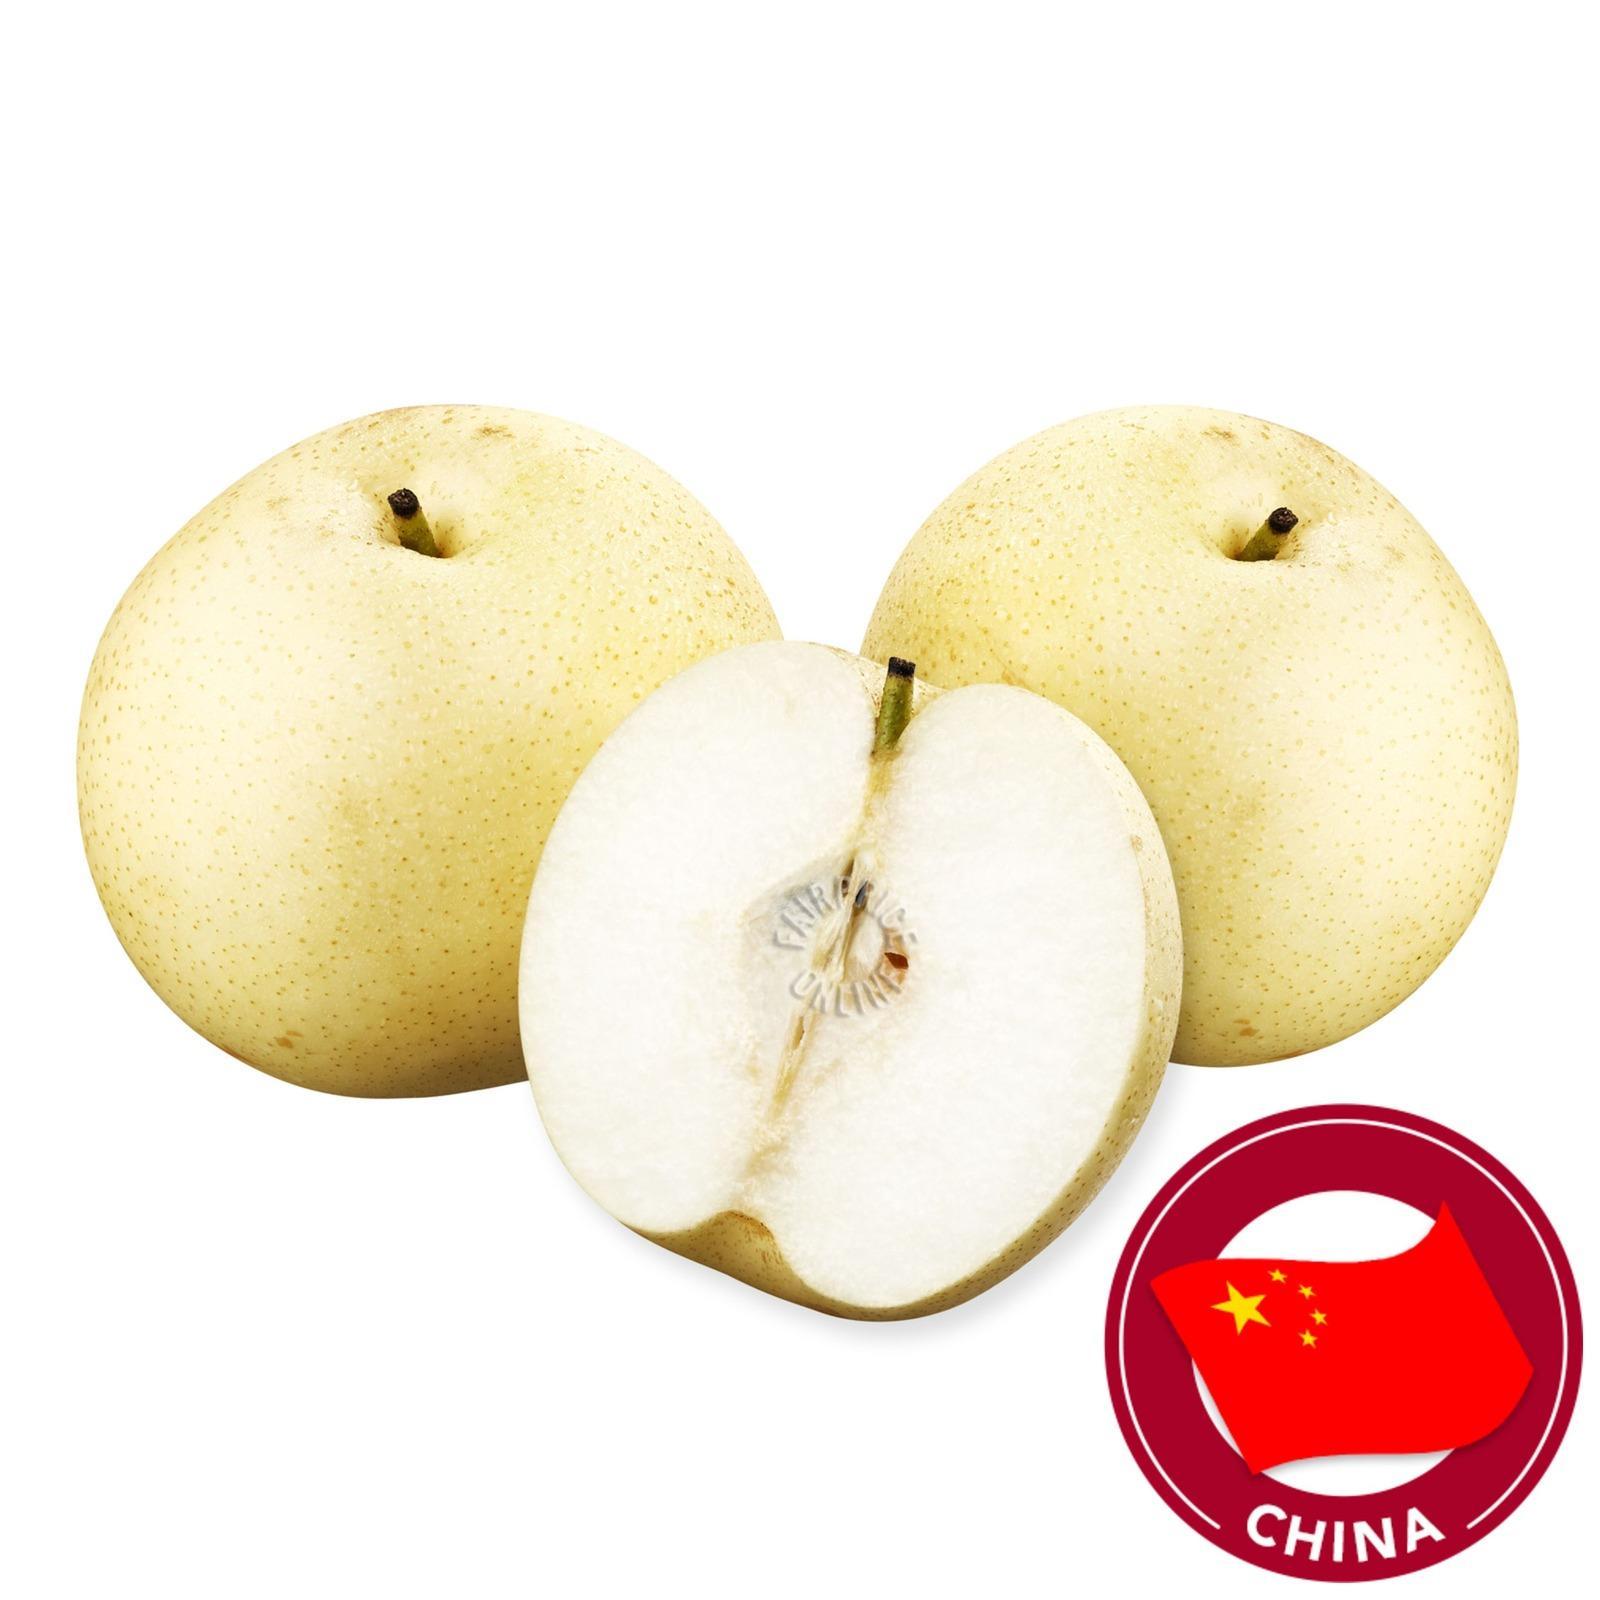 Pasar China Golden Pear